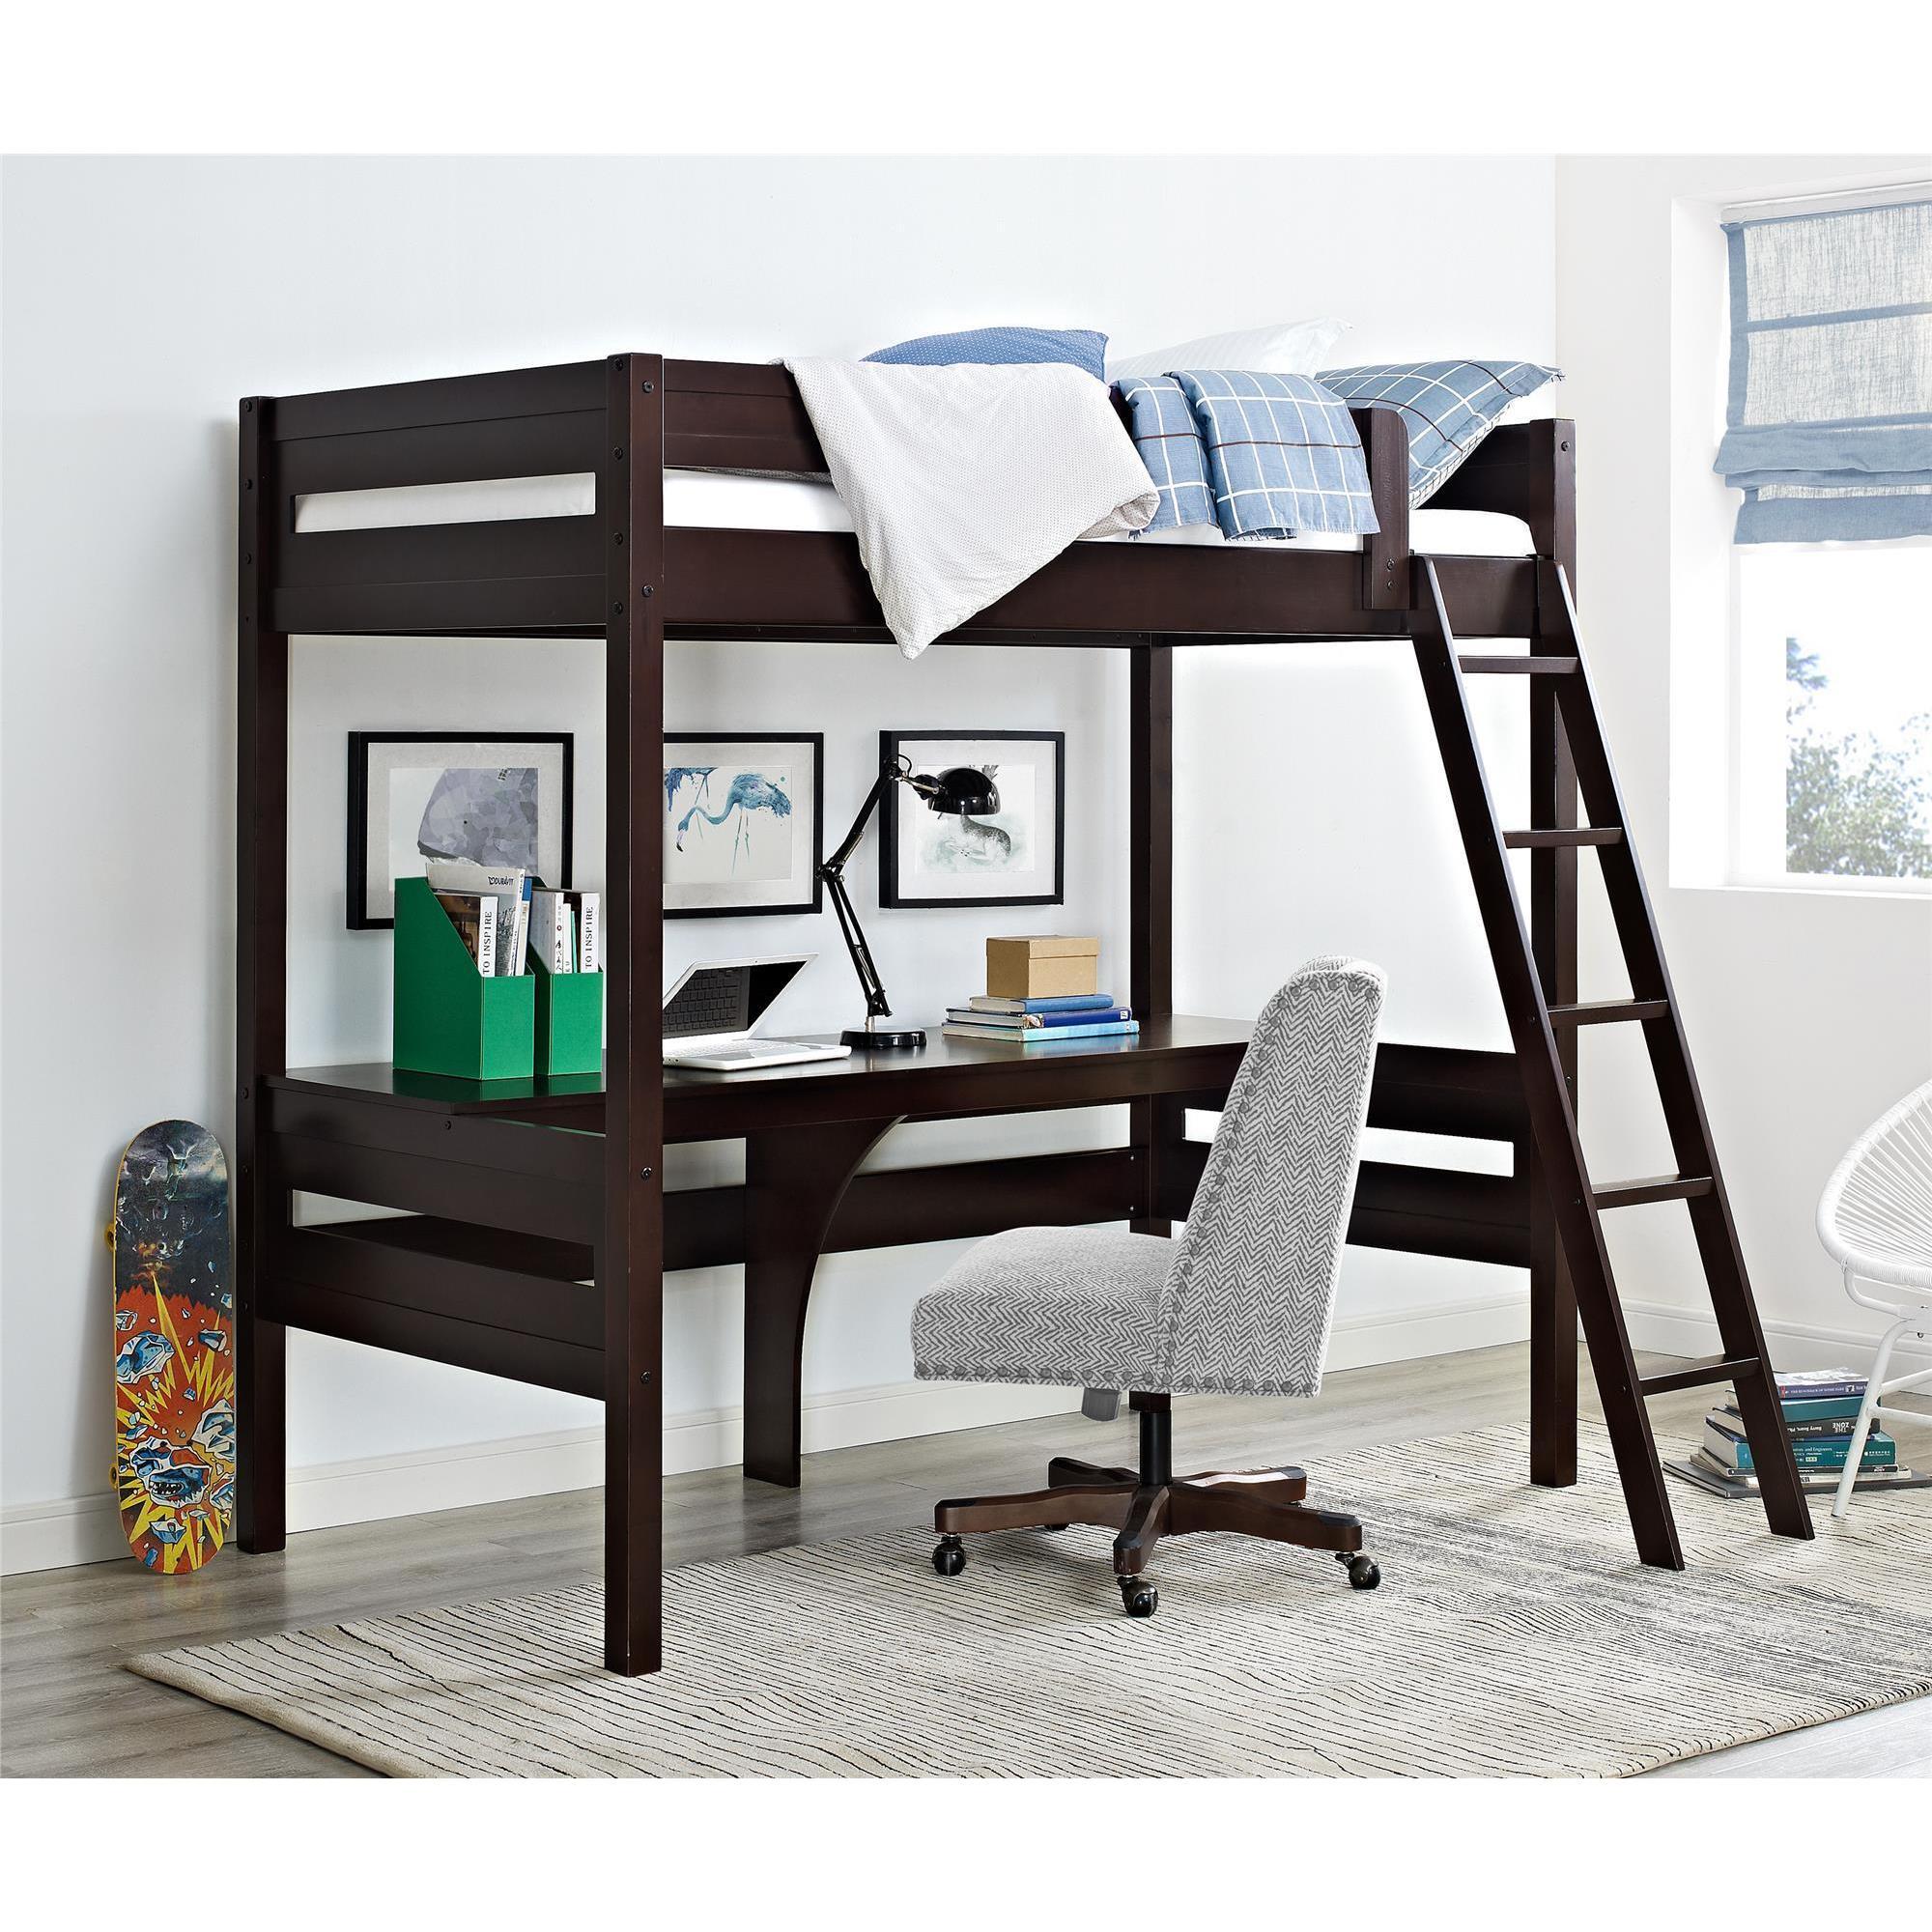 Dorel Living Harlan Loft Bed with Desk (Loft bed, espress...